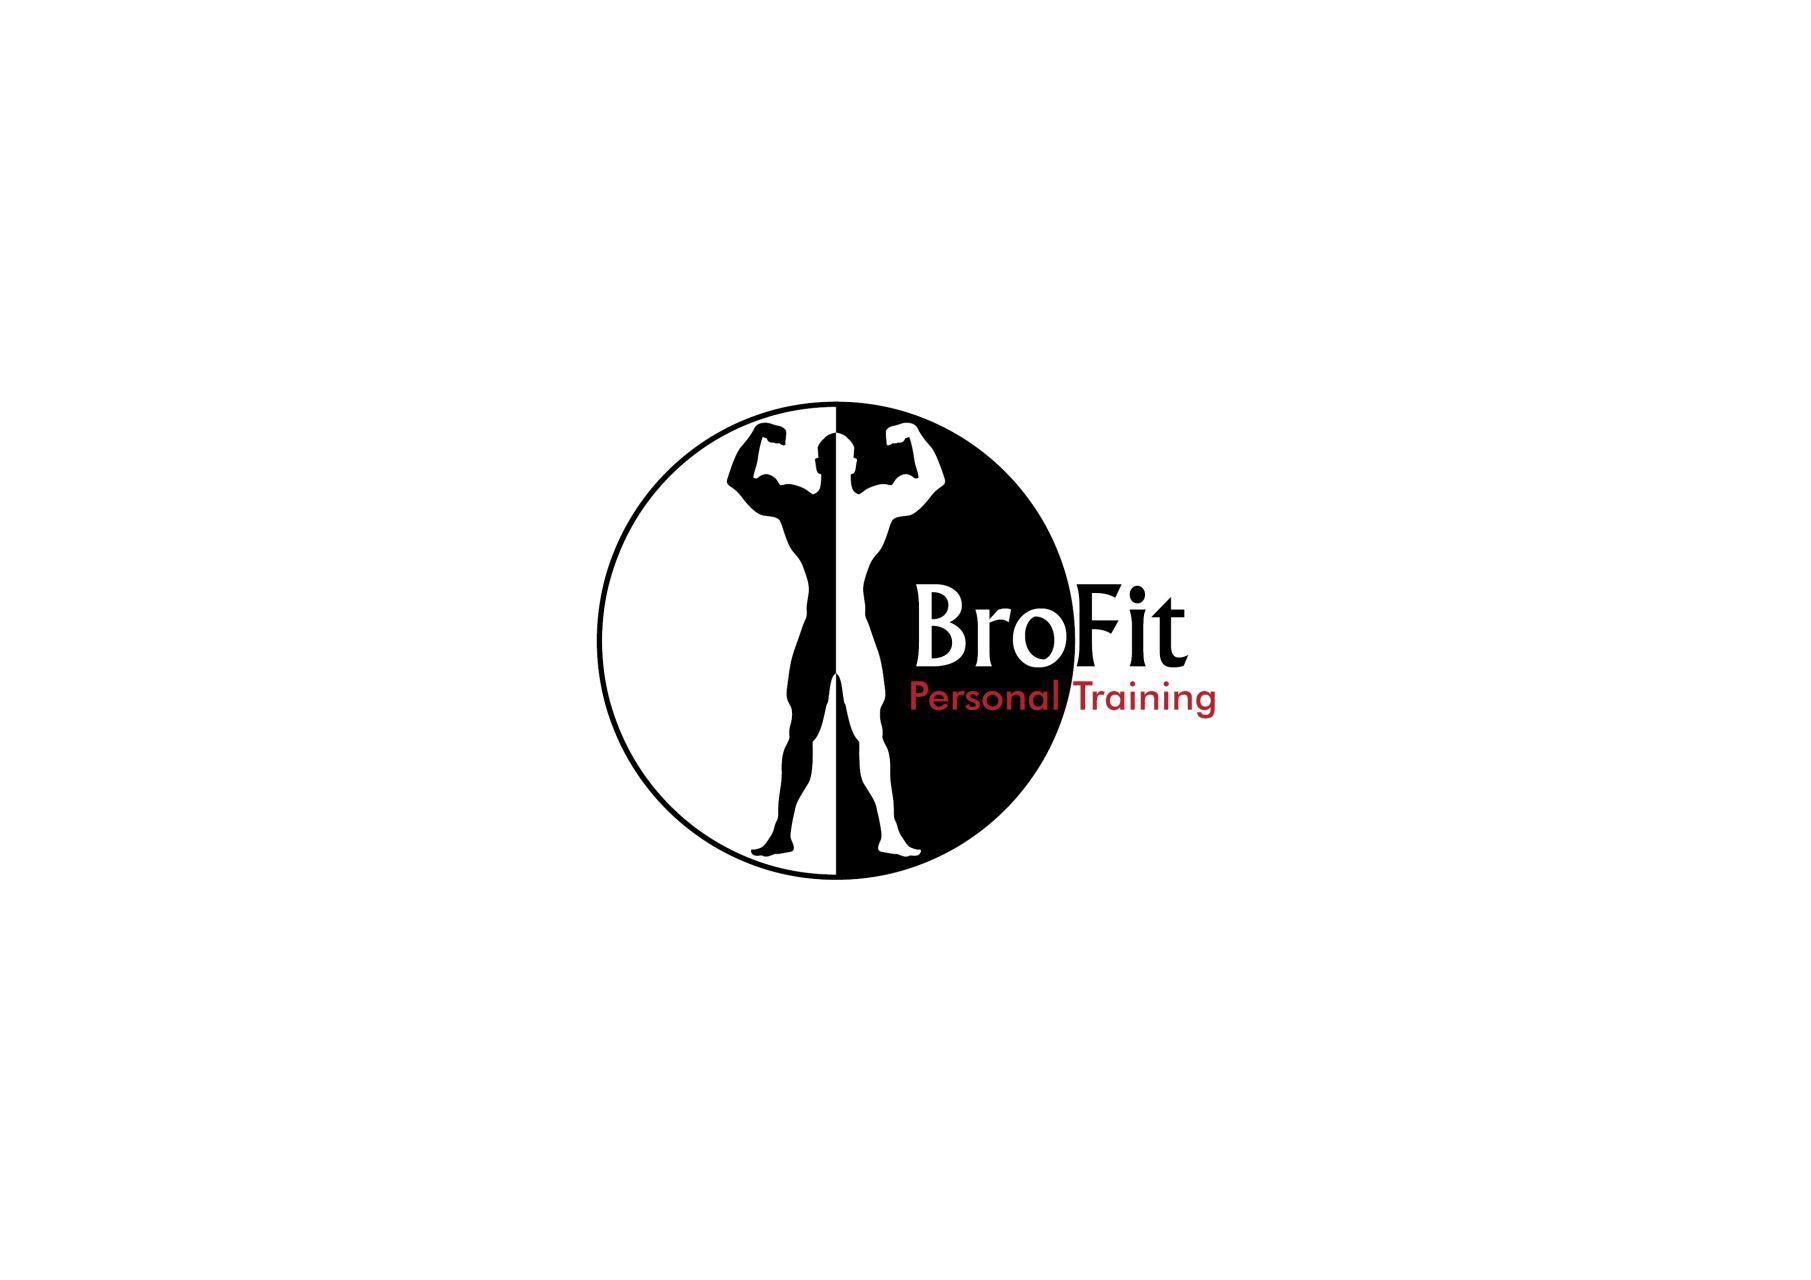 BroFit Personal Training